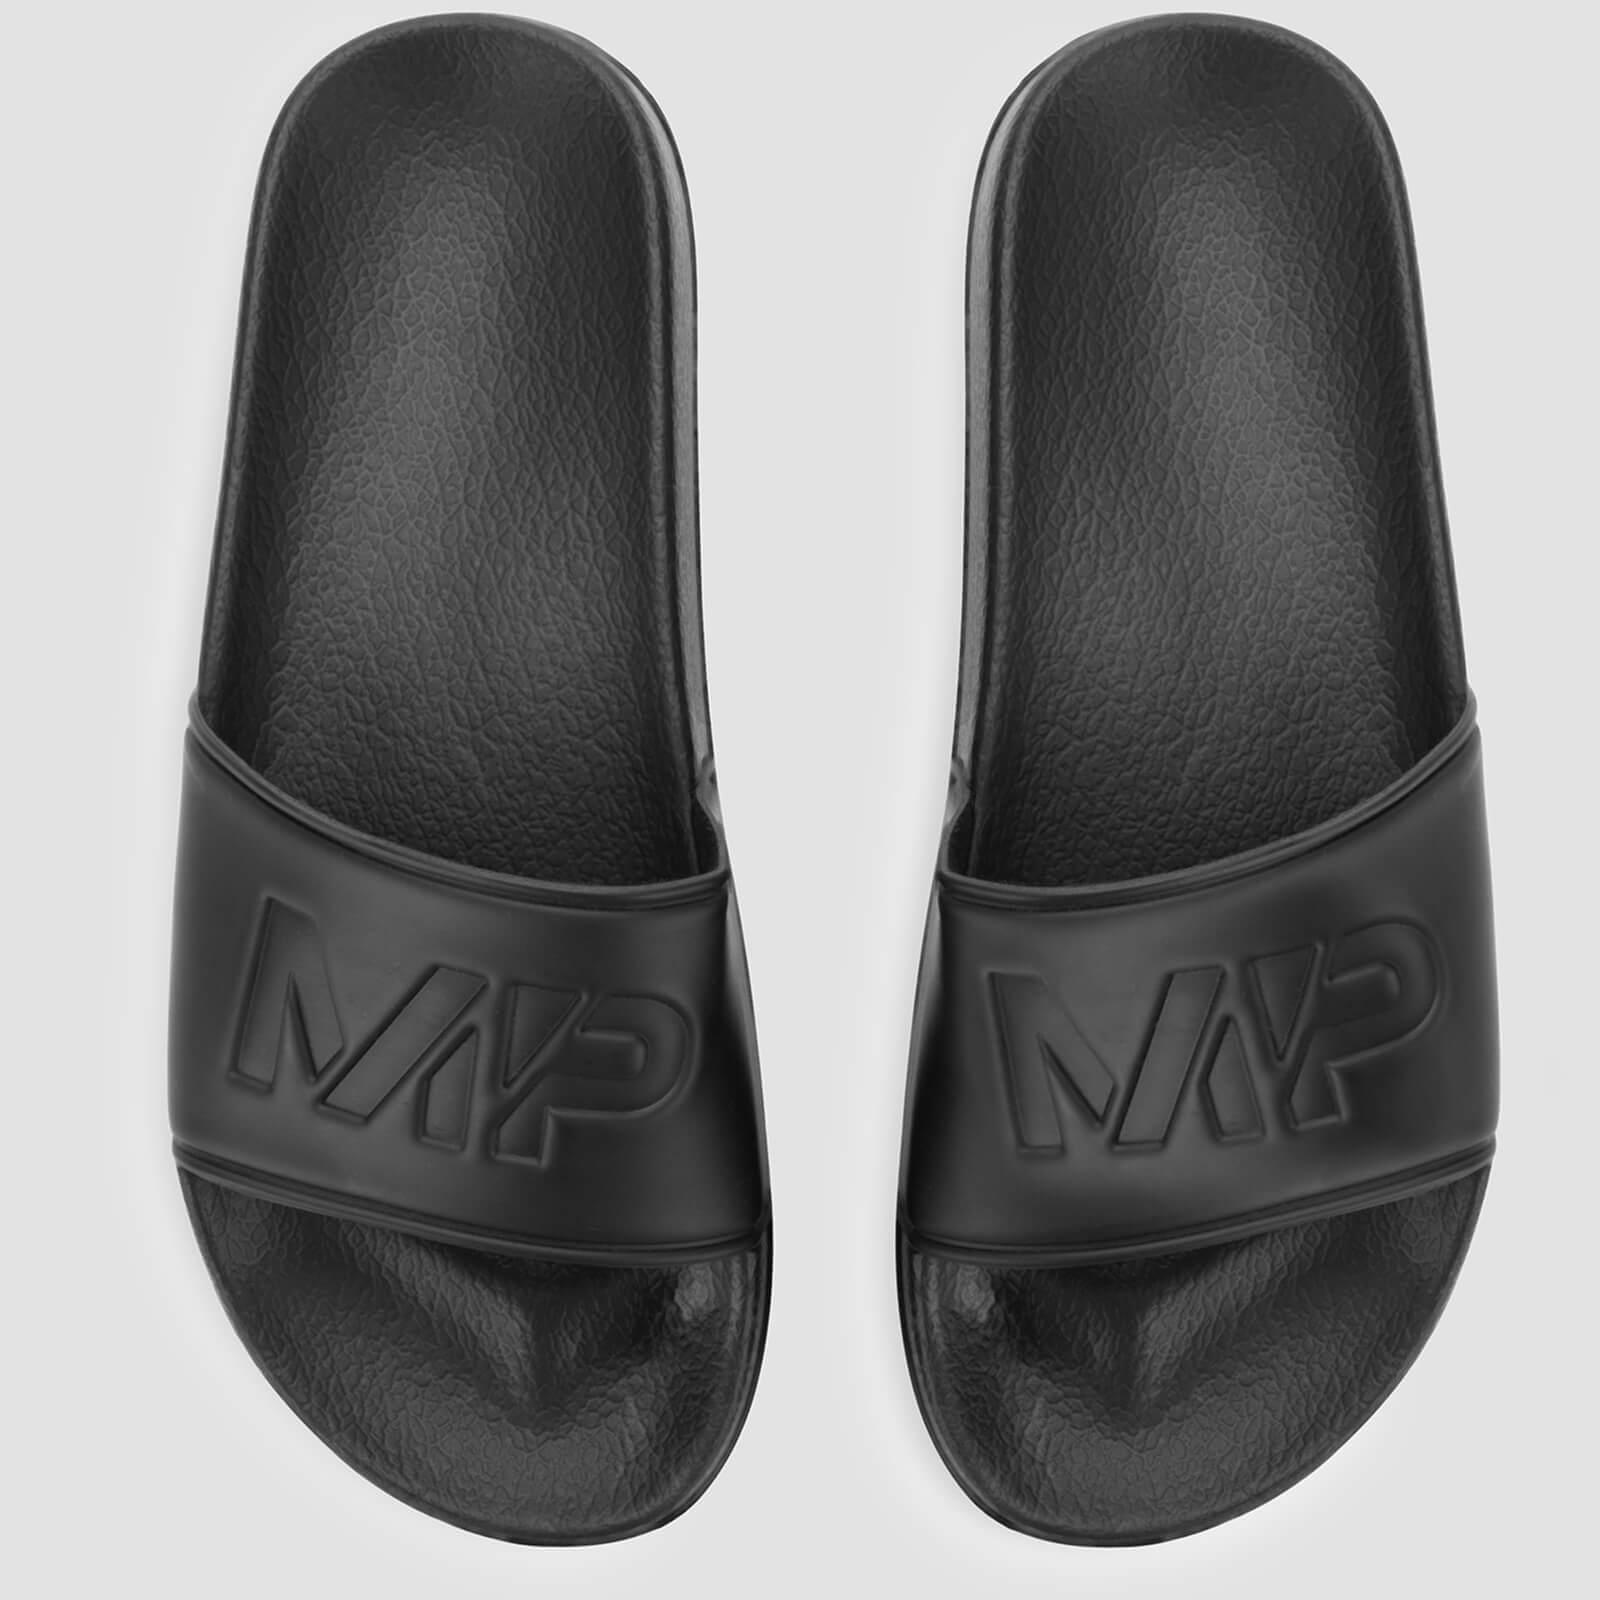 Myprotein MP Men's Sliders - Black - UK 8